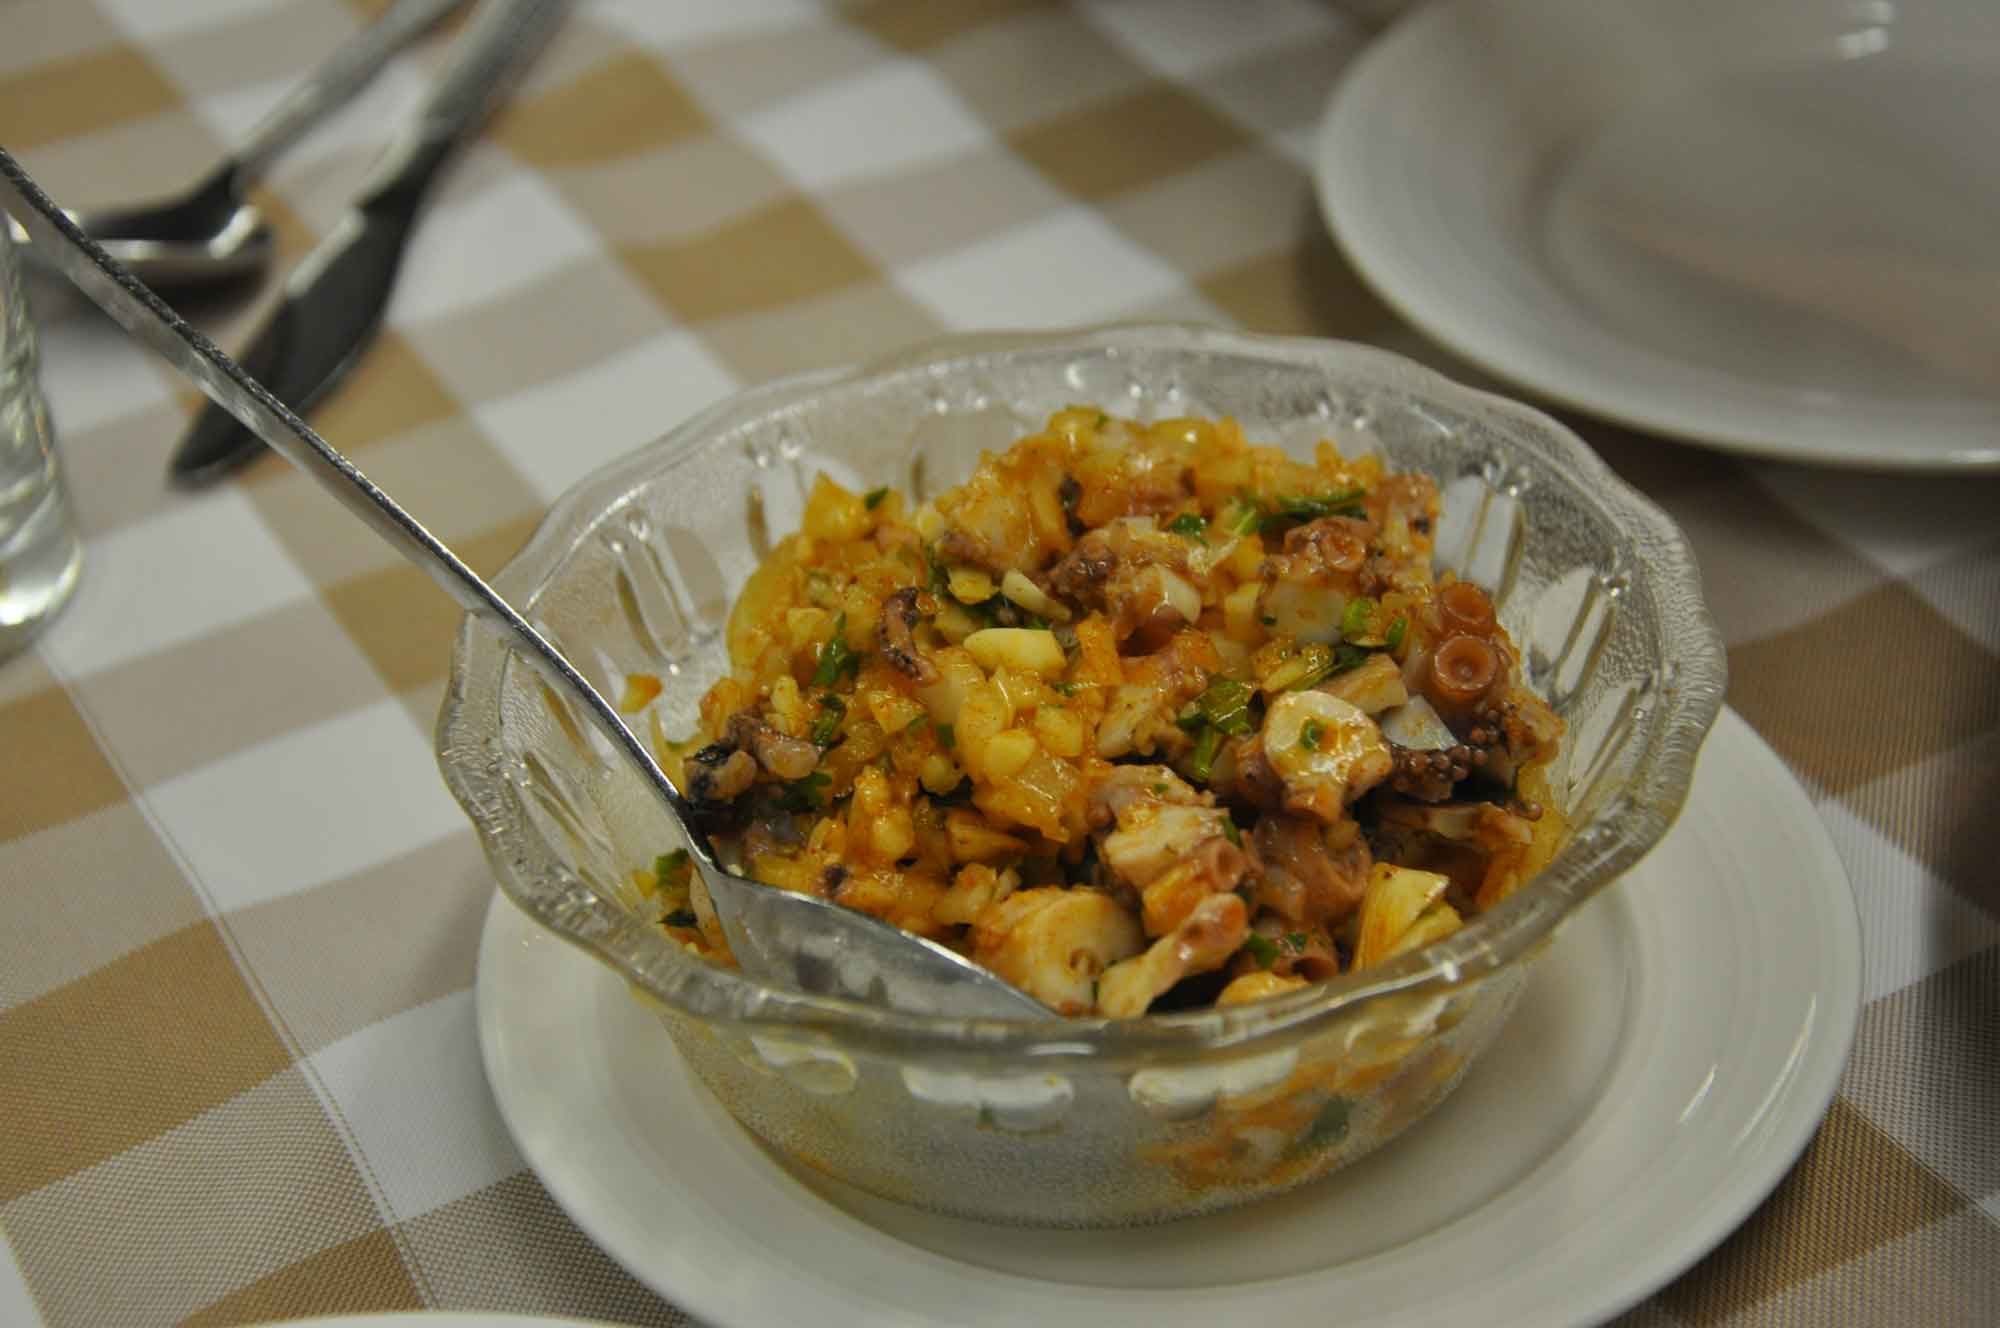 A Lorcha Macau octopus salad